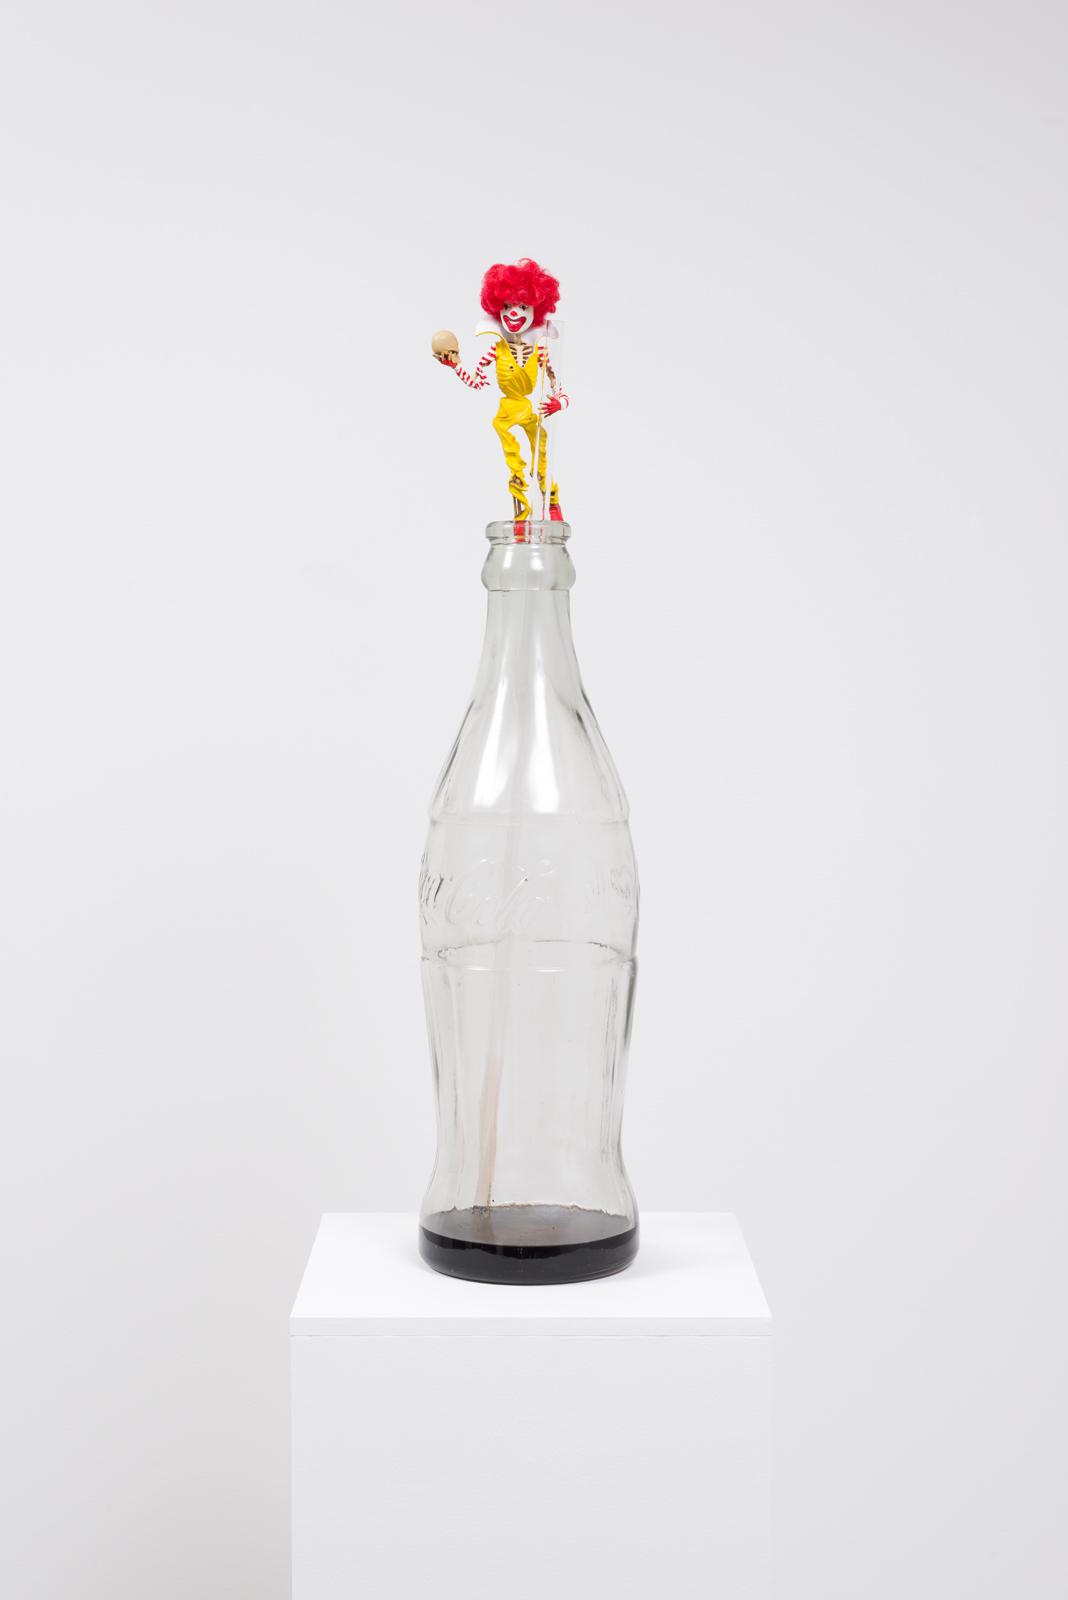 The Last Mexican Coke, 2017  Jumbo glass Coke bottle, Plexiglas, resin and vinyl action figure, pedestal